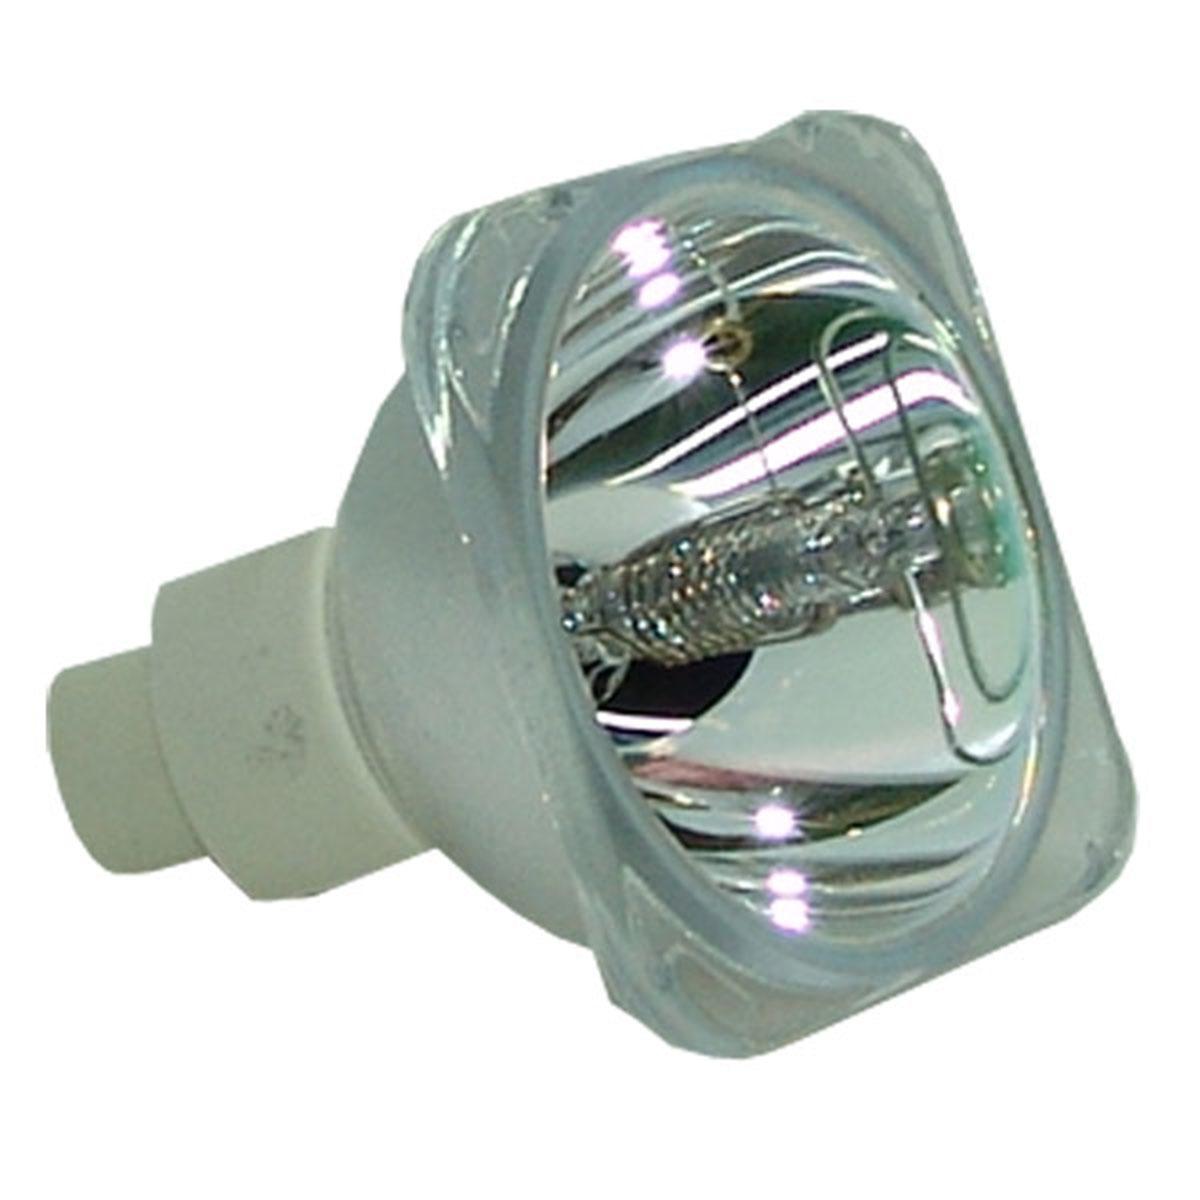 Original Osram Projector Lamp Replacement with Housing for BenQ 5J.J9V05.001 - image 4 de 5